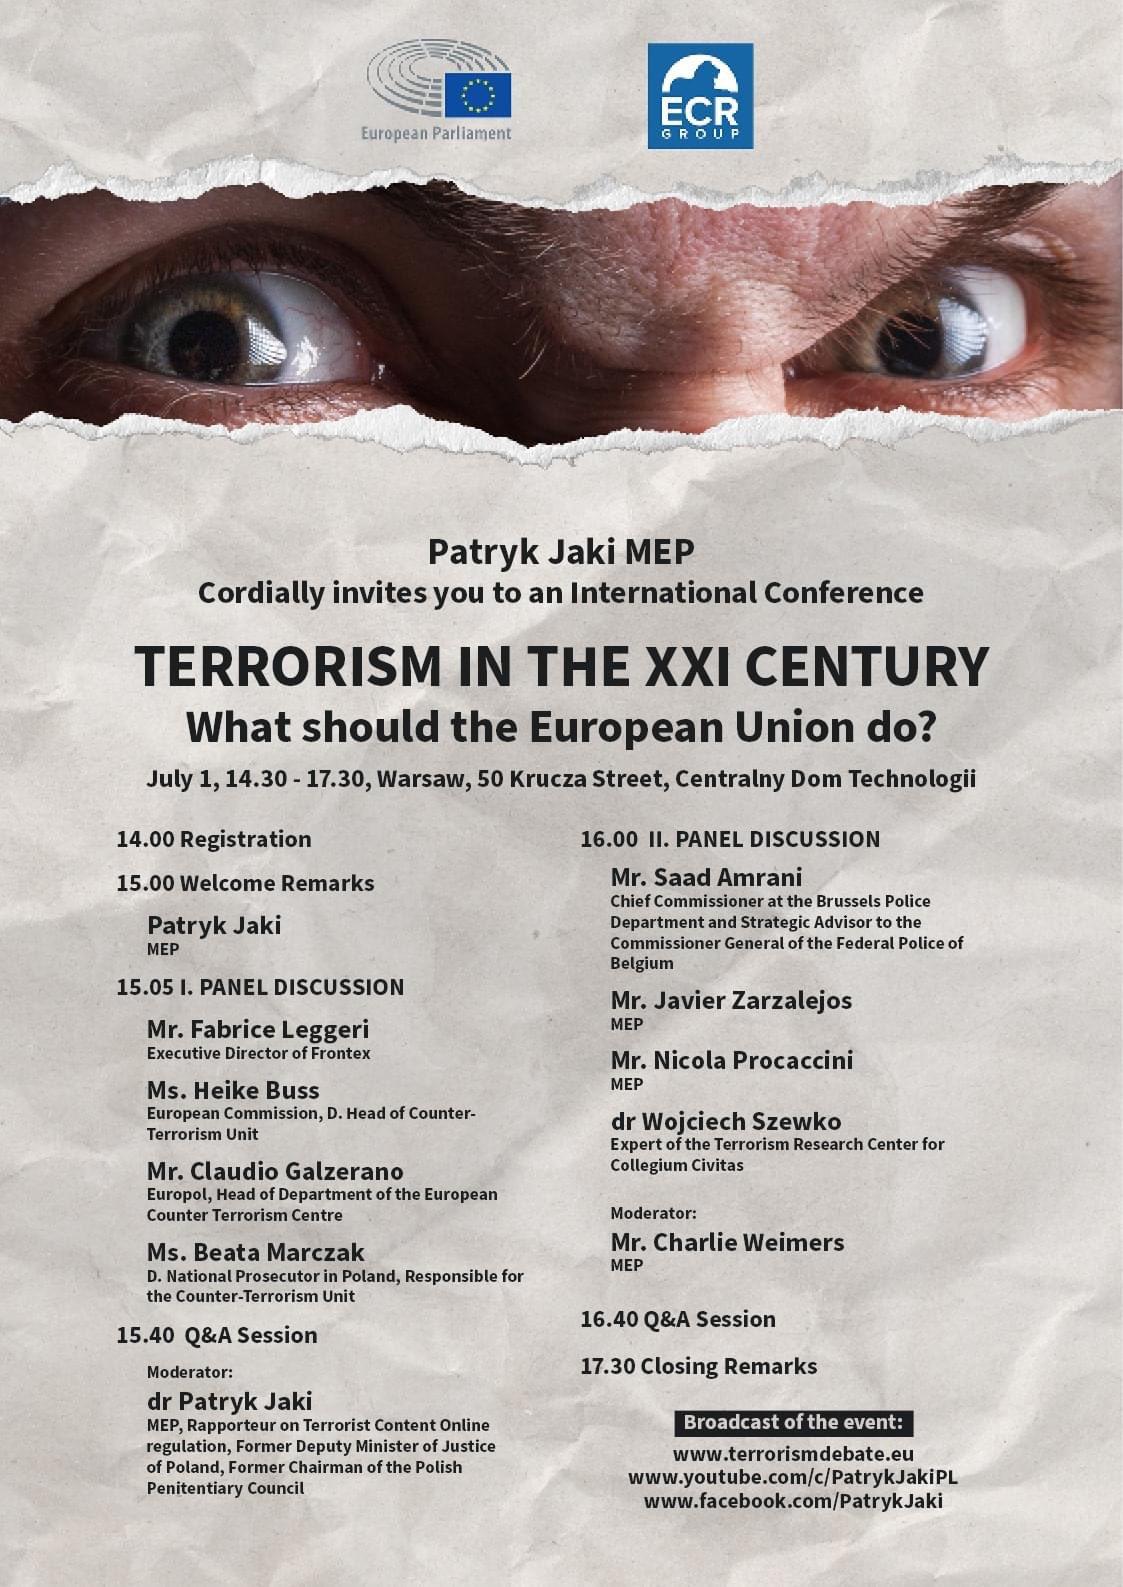 Terrorism in the XXI century - What should the EU do?